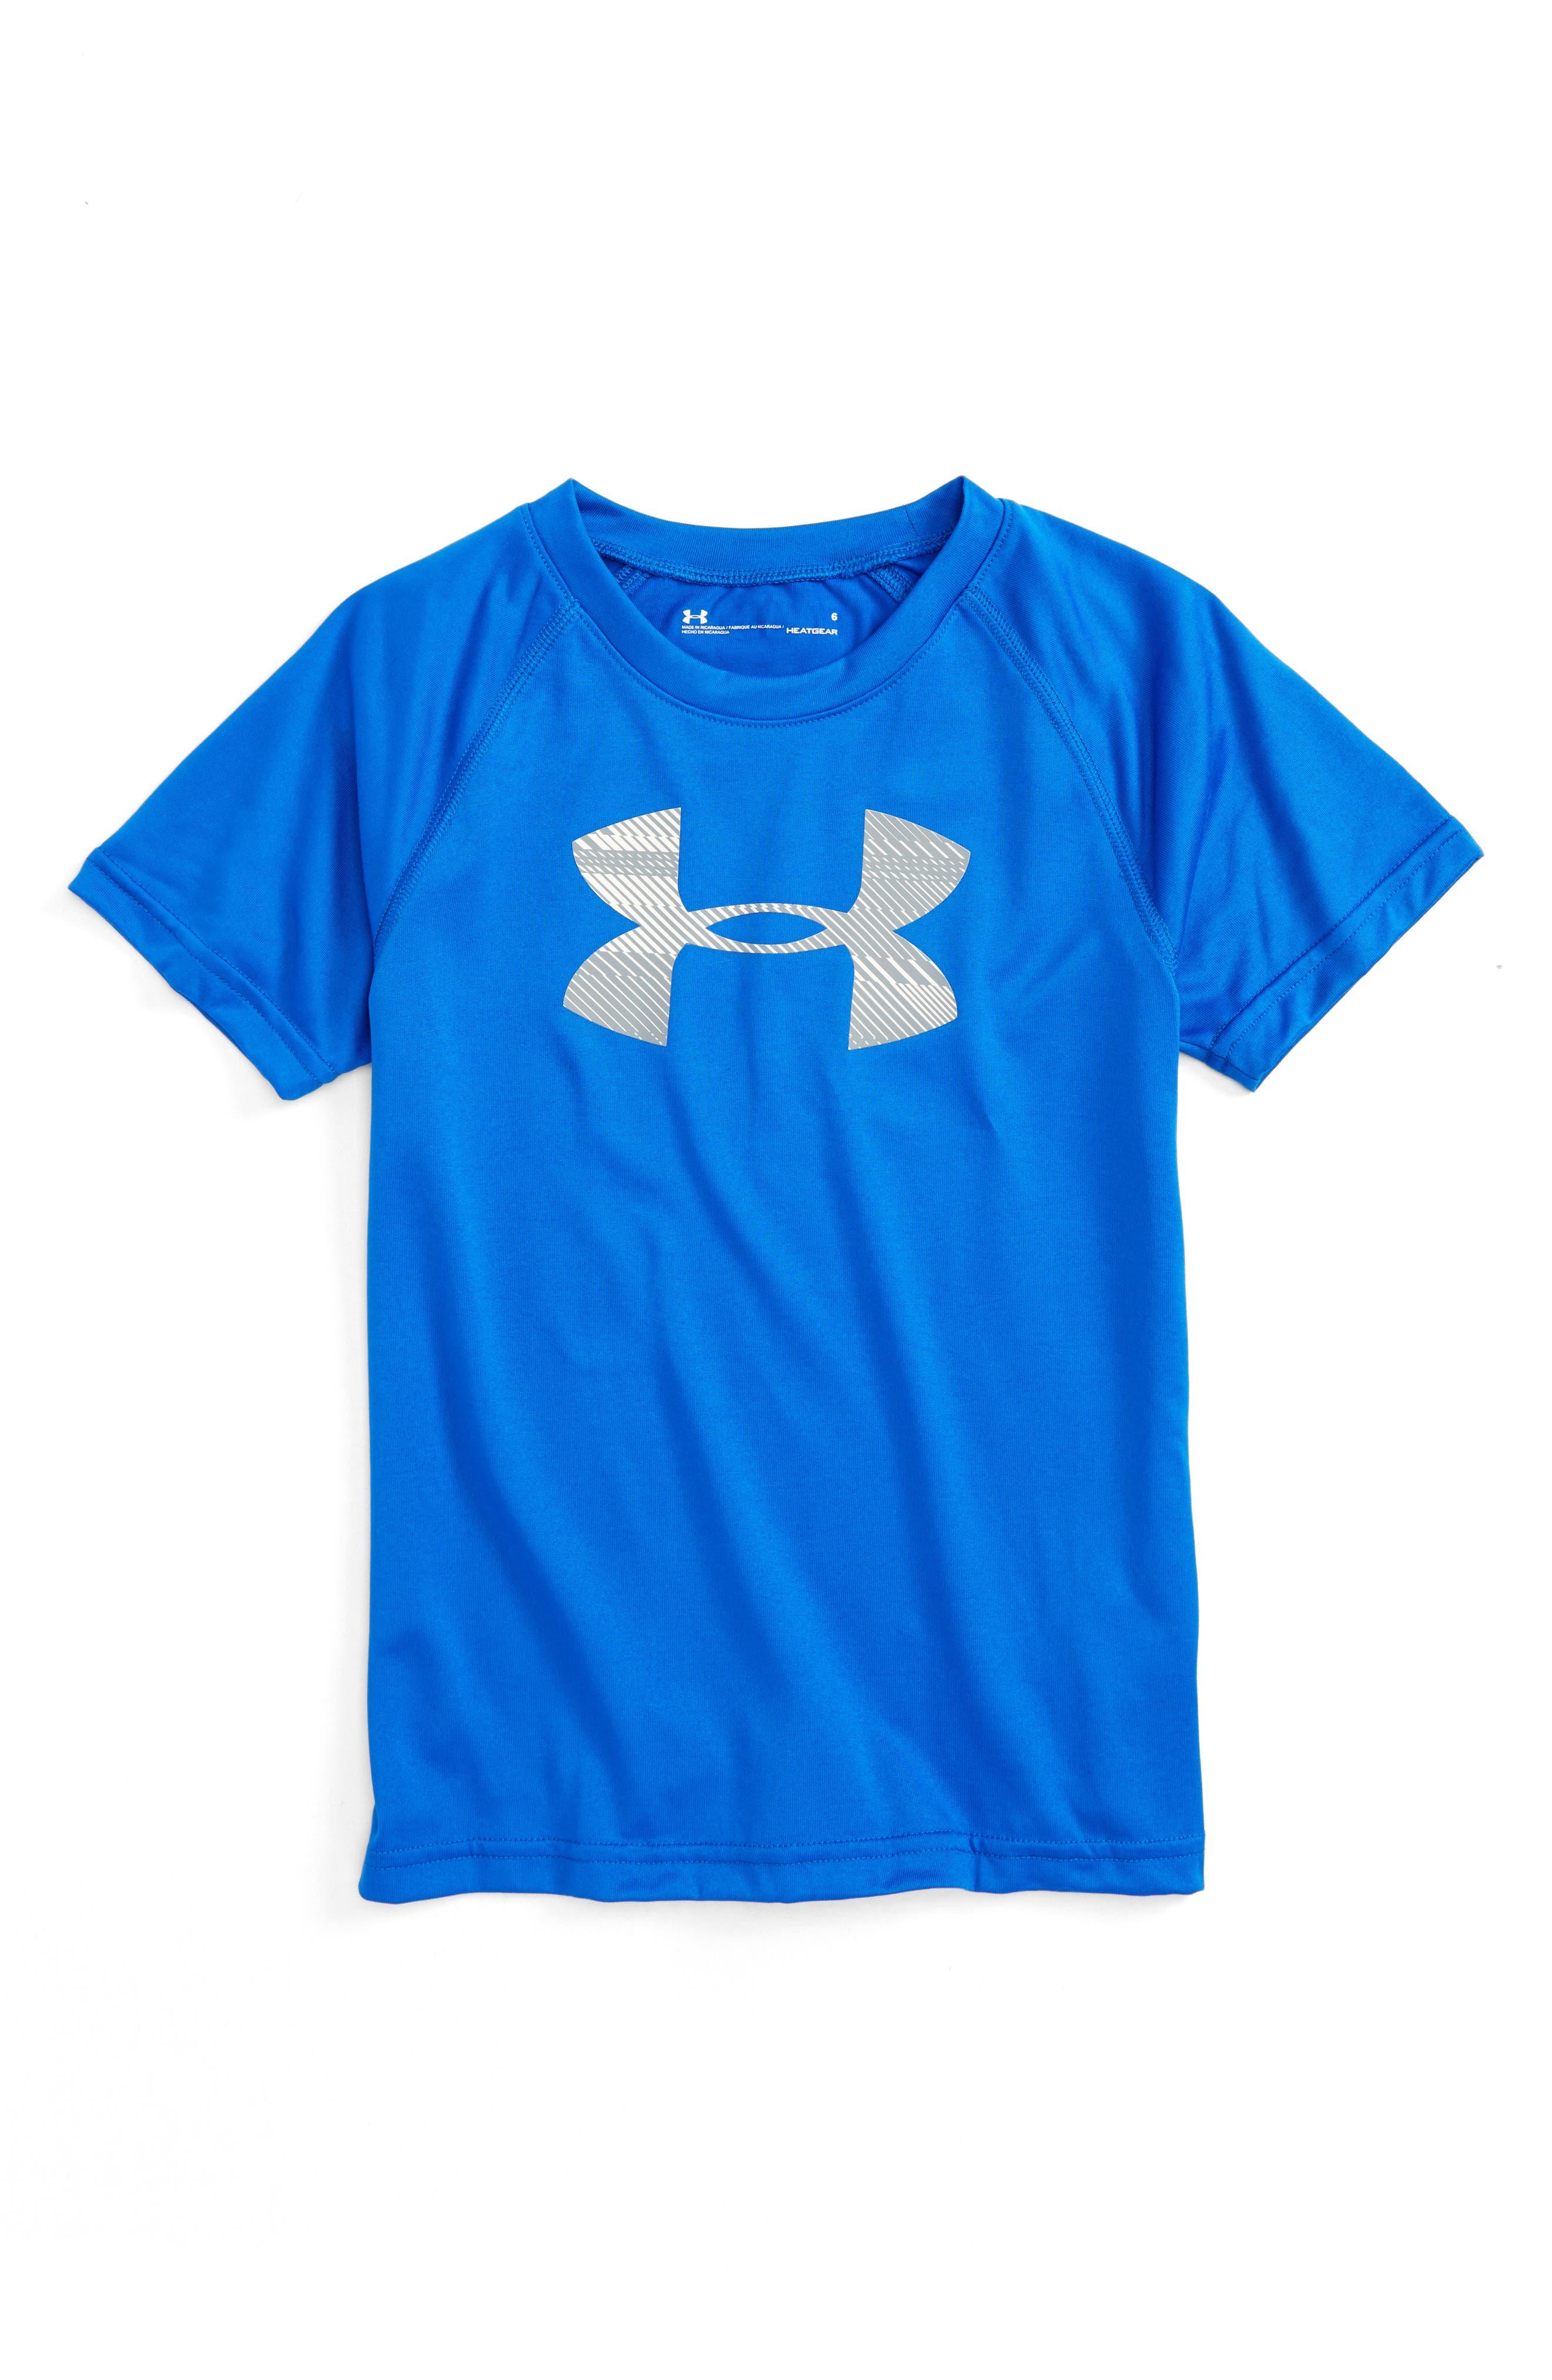 Speed Lines HeatGear<sup>®</sup> T-Shirt,                             Main thumbnail 1, color,                             410